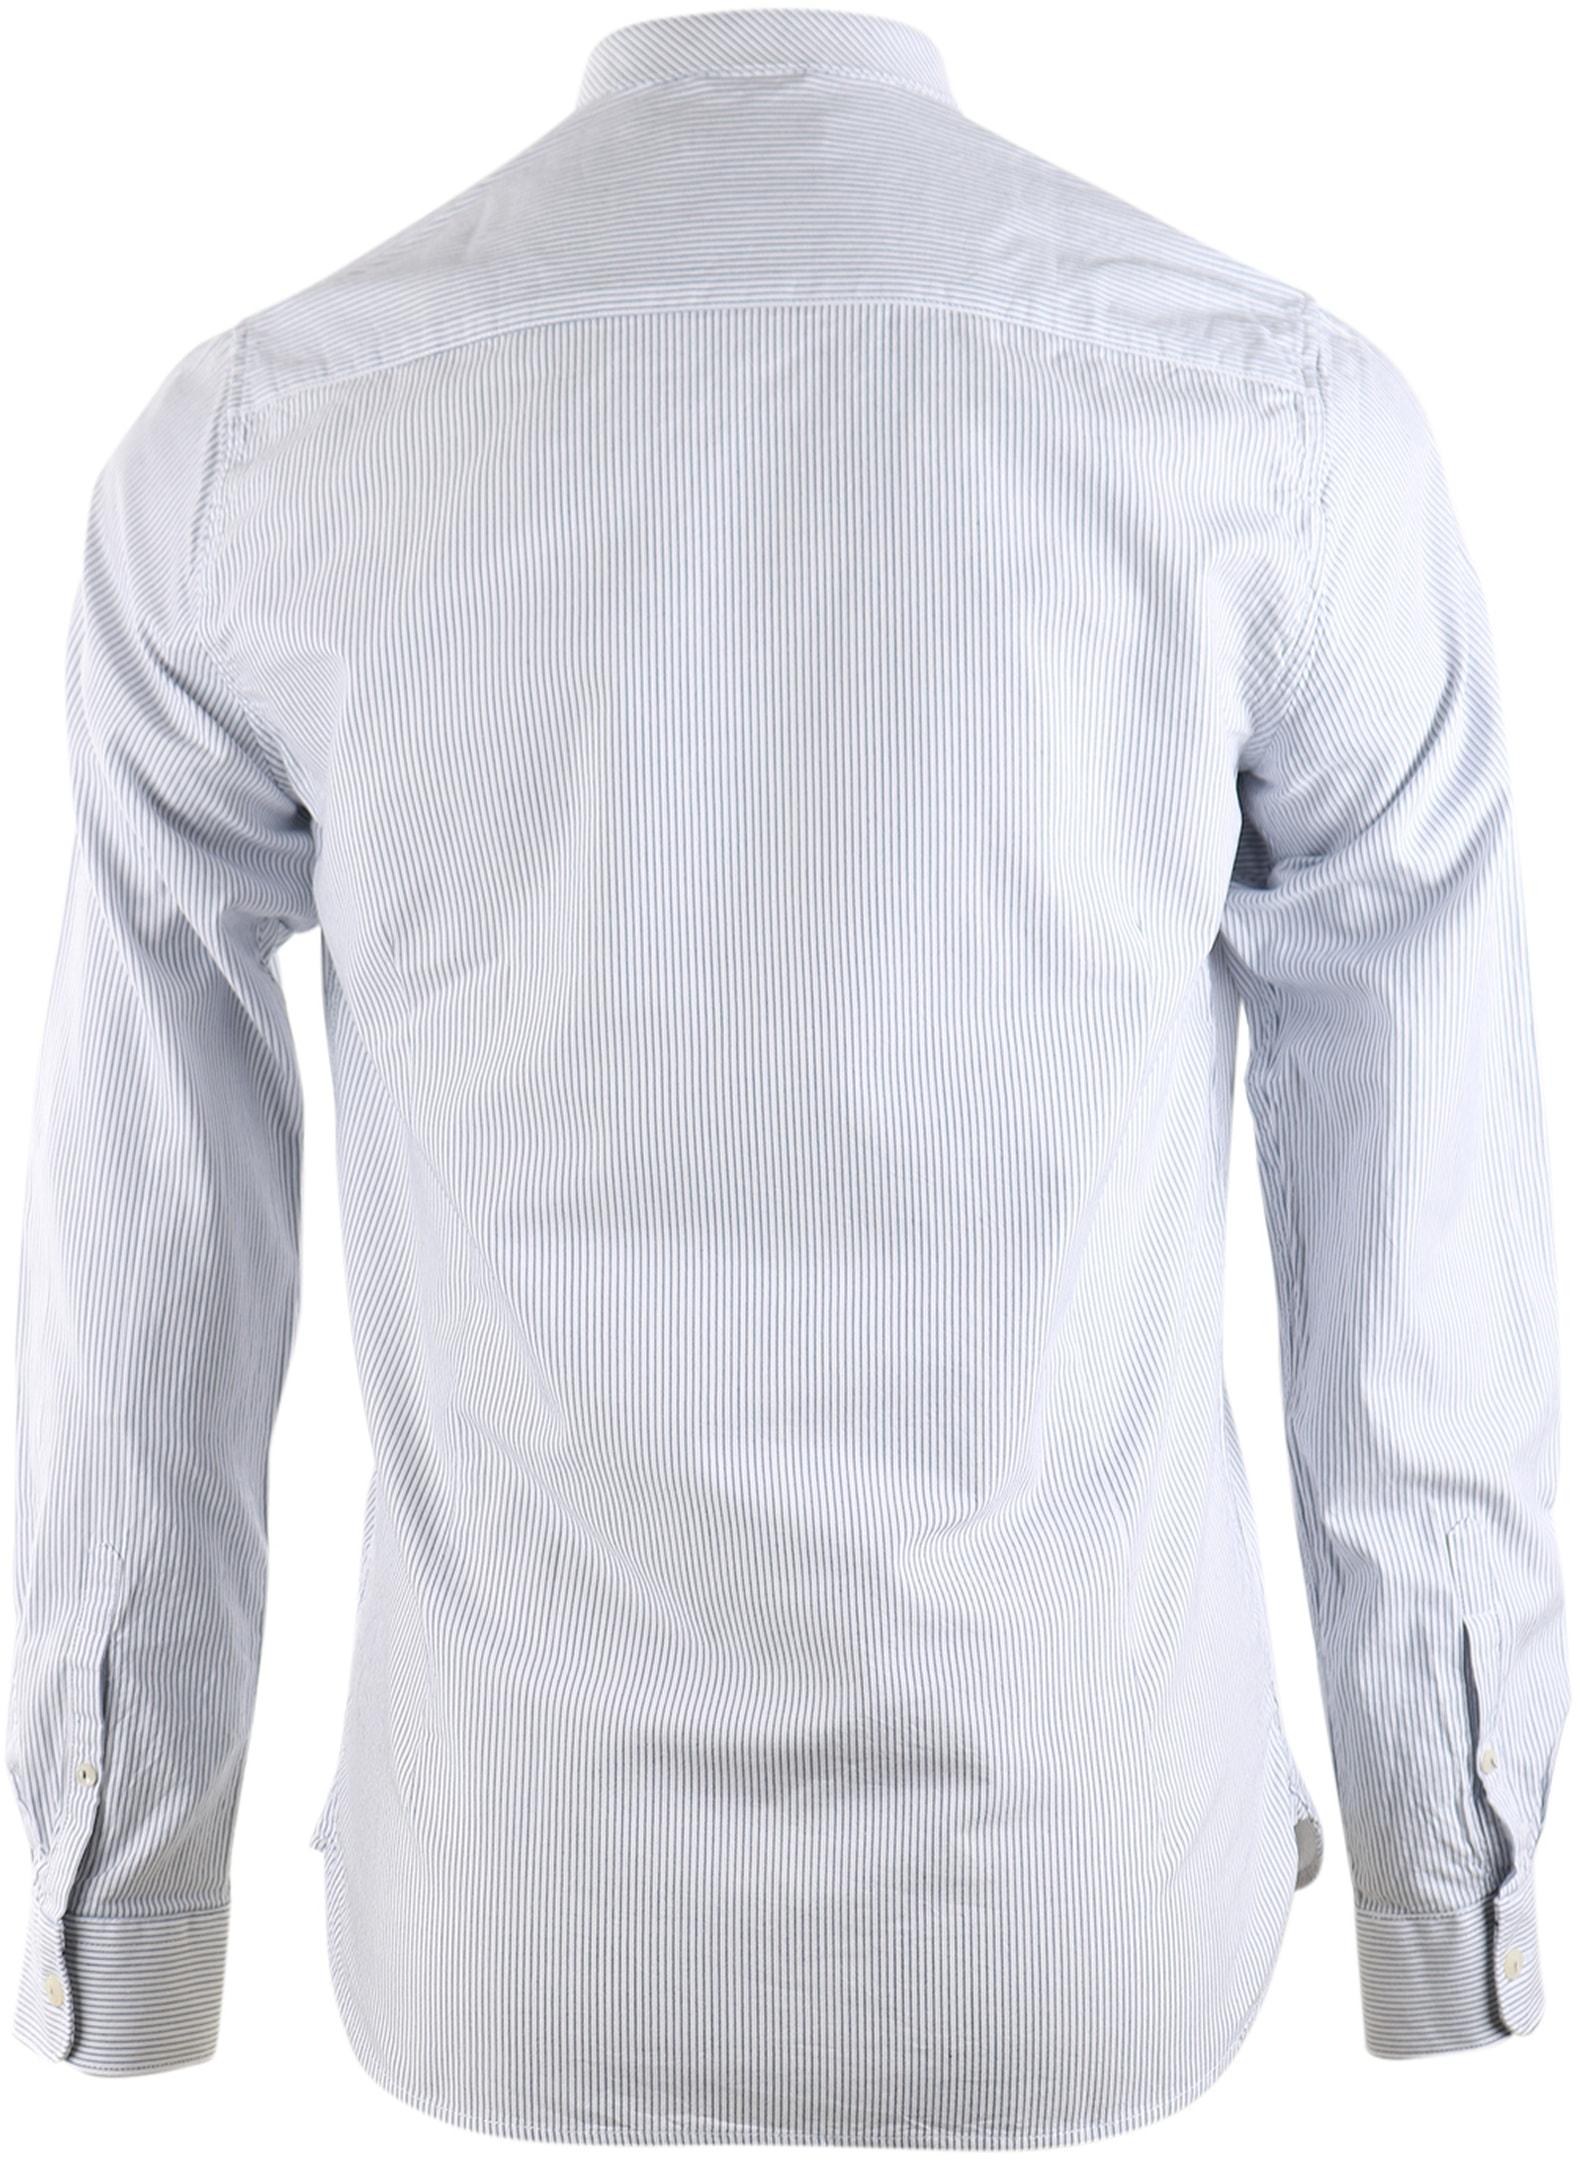 Dstrezzed Shirt Mao Stripes foto 1